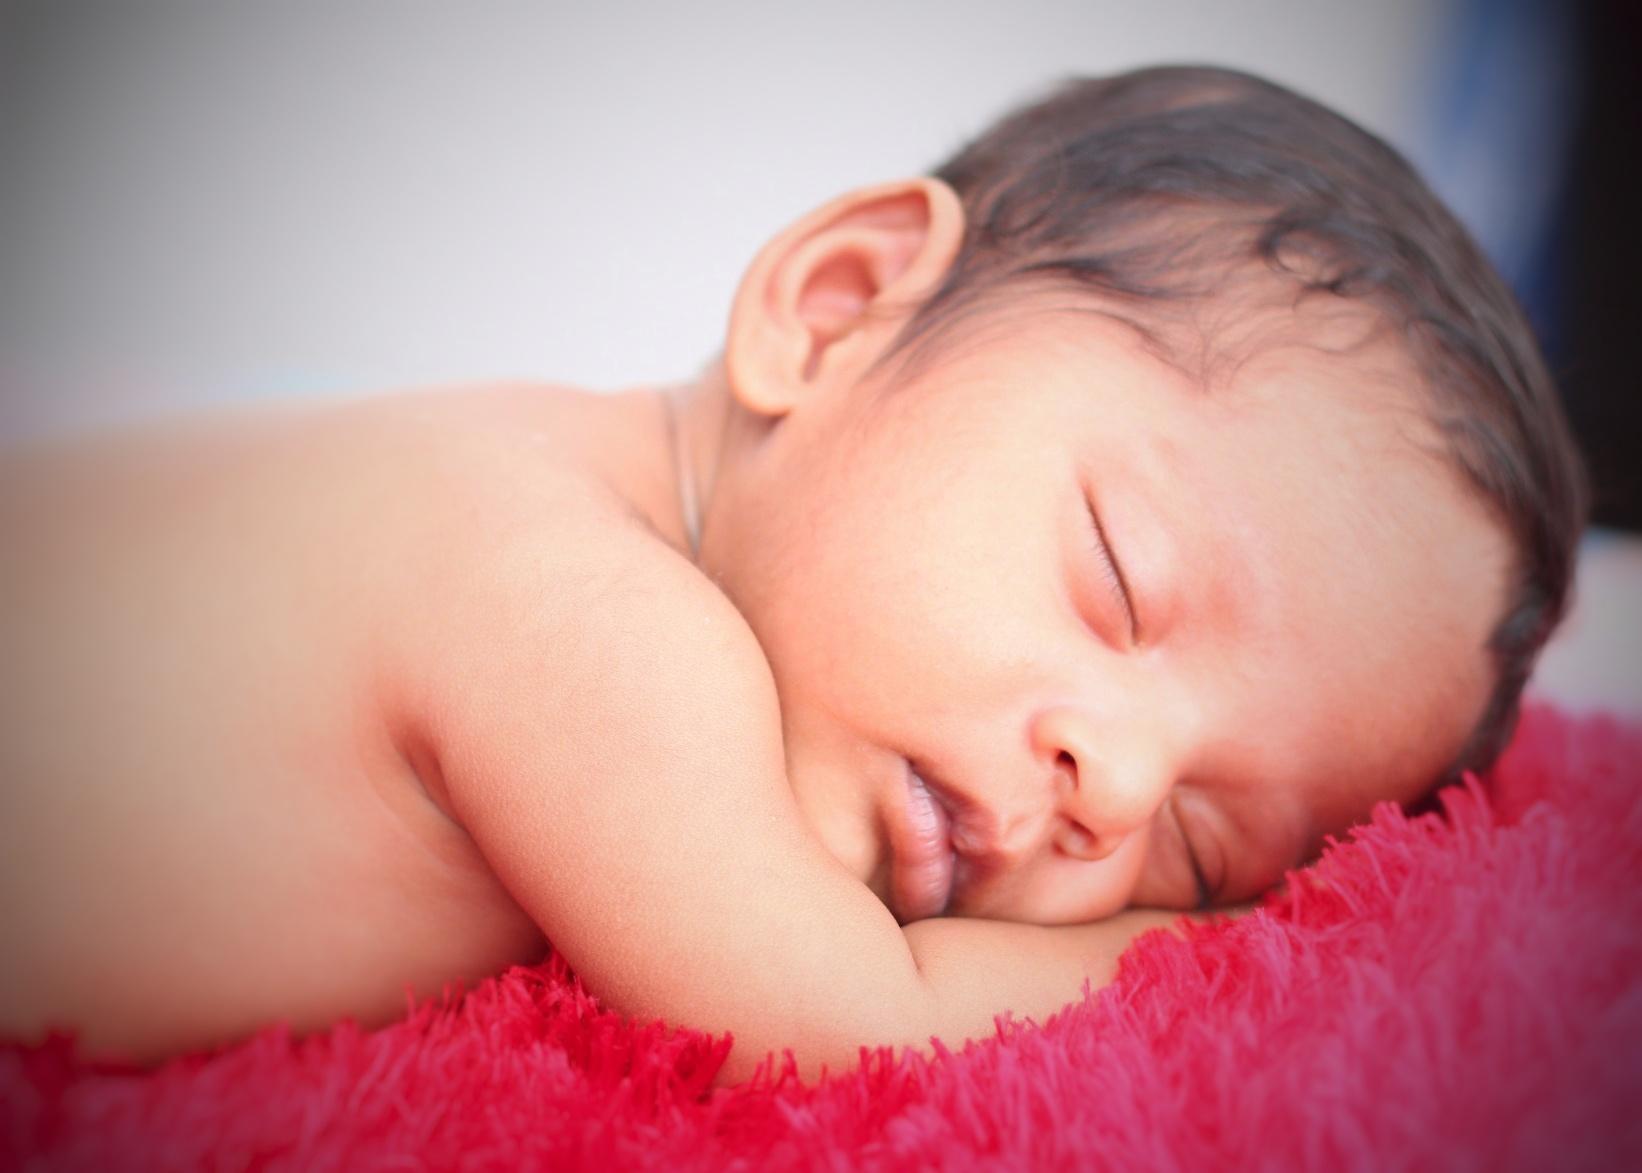 A soft Baby